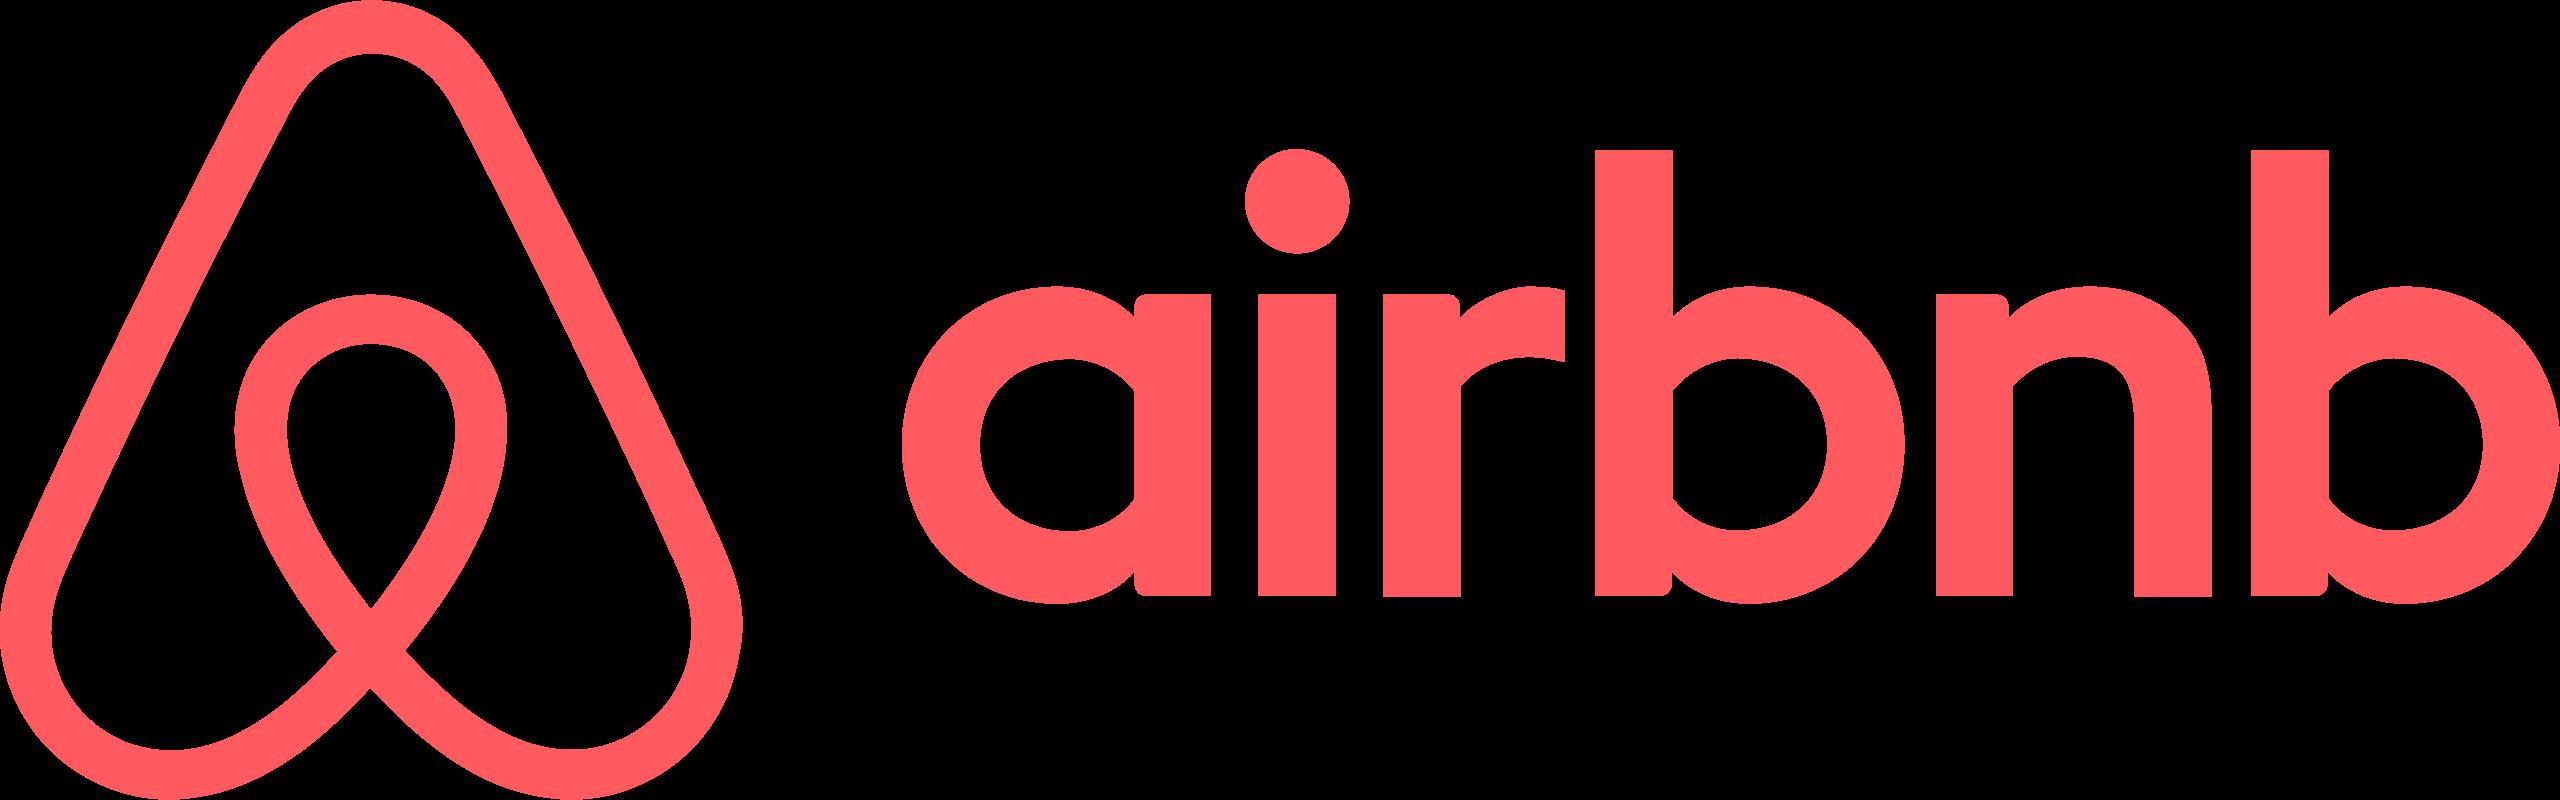 Airbnb infolinia   Kontakt, telefon, numer, dane kontaktowe, adres